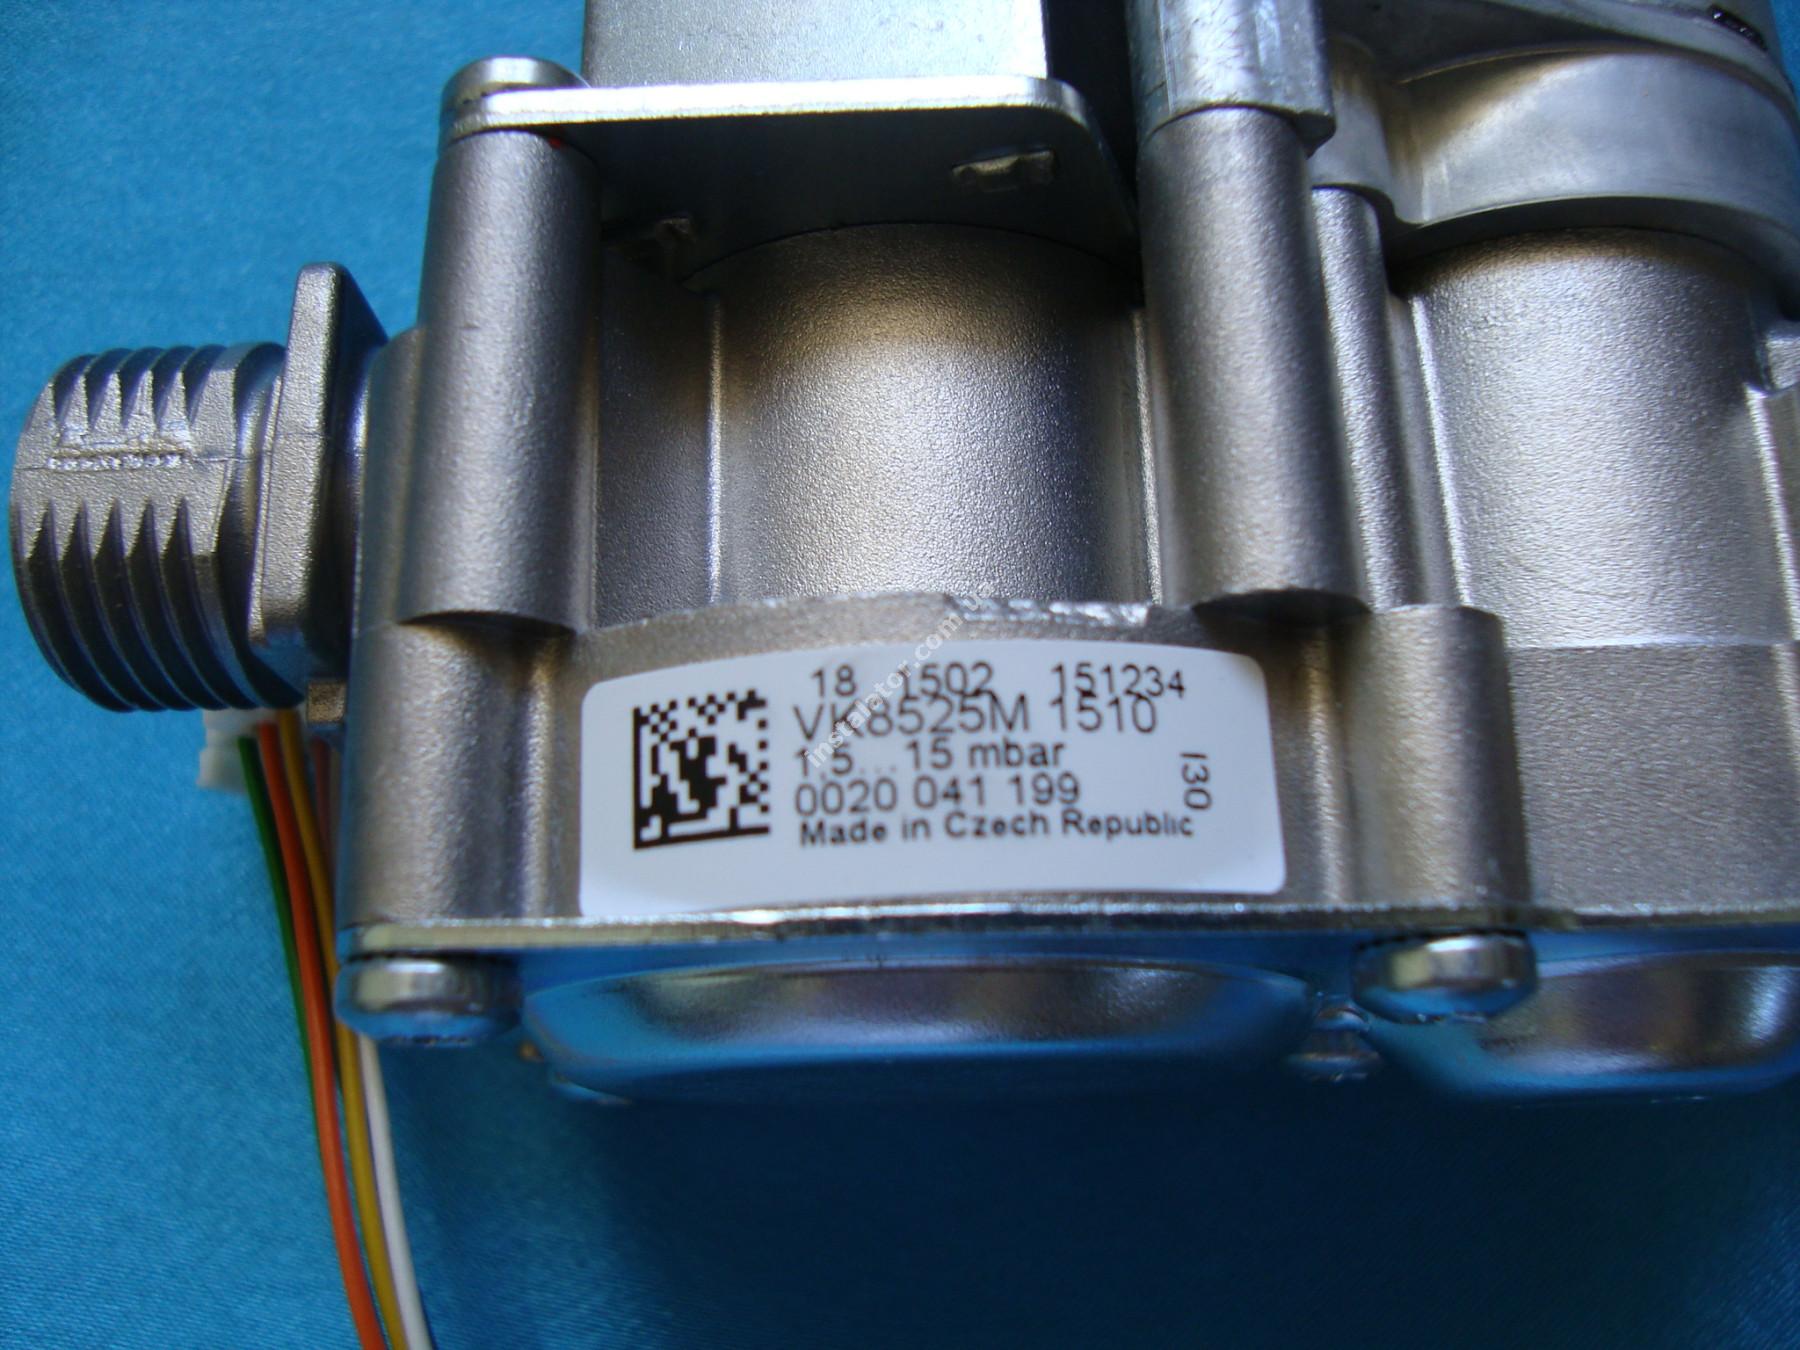 053520 Газовий клапан колонки VAILLANT MAG 16-0/0 XEA G20 (HONEYWELL CE-1312BM354) full-image-1